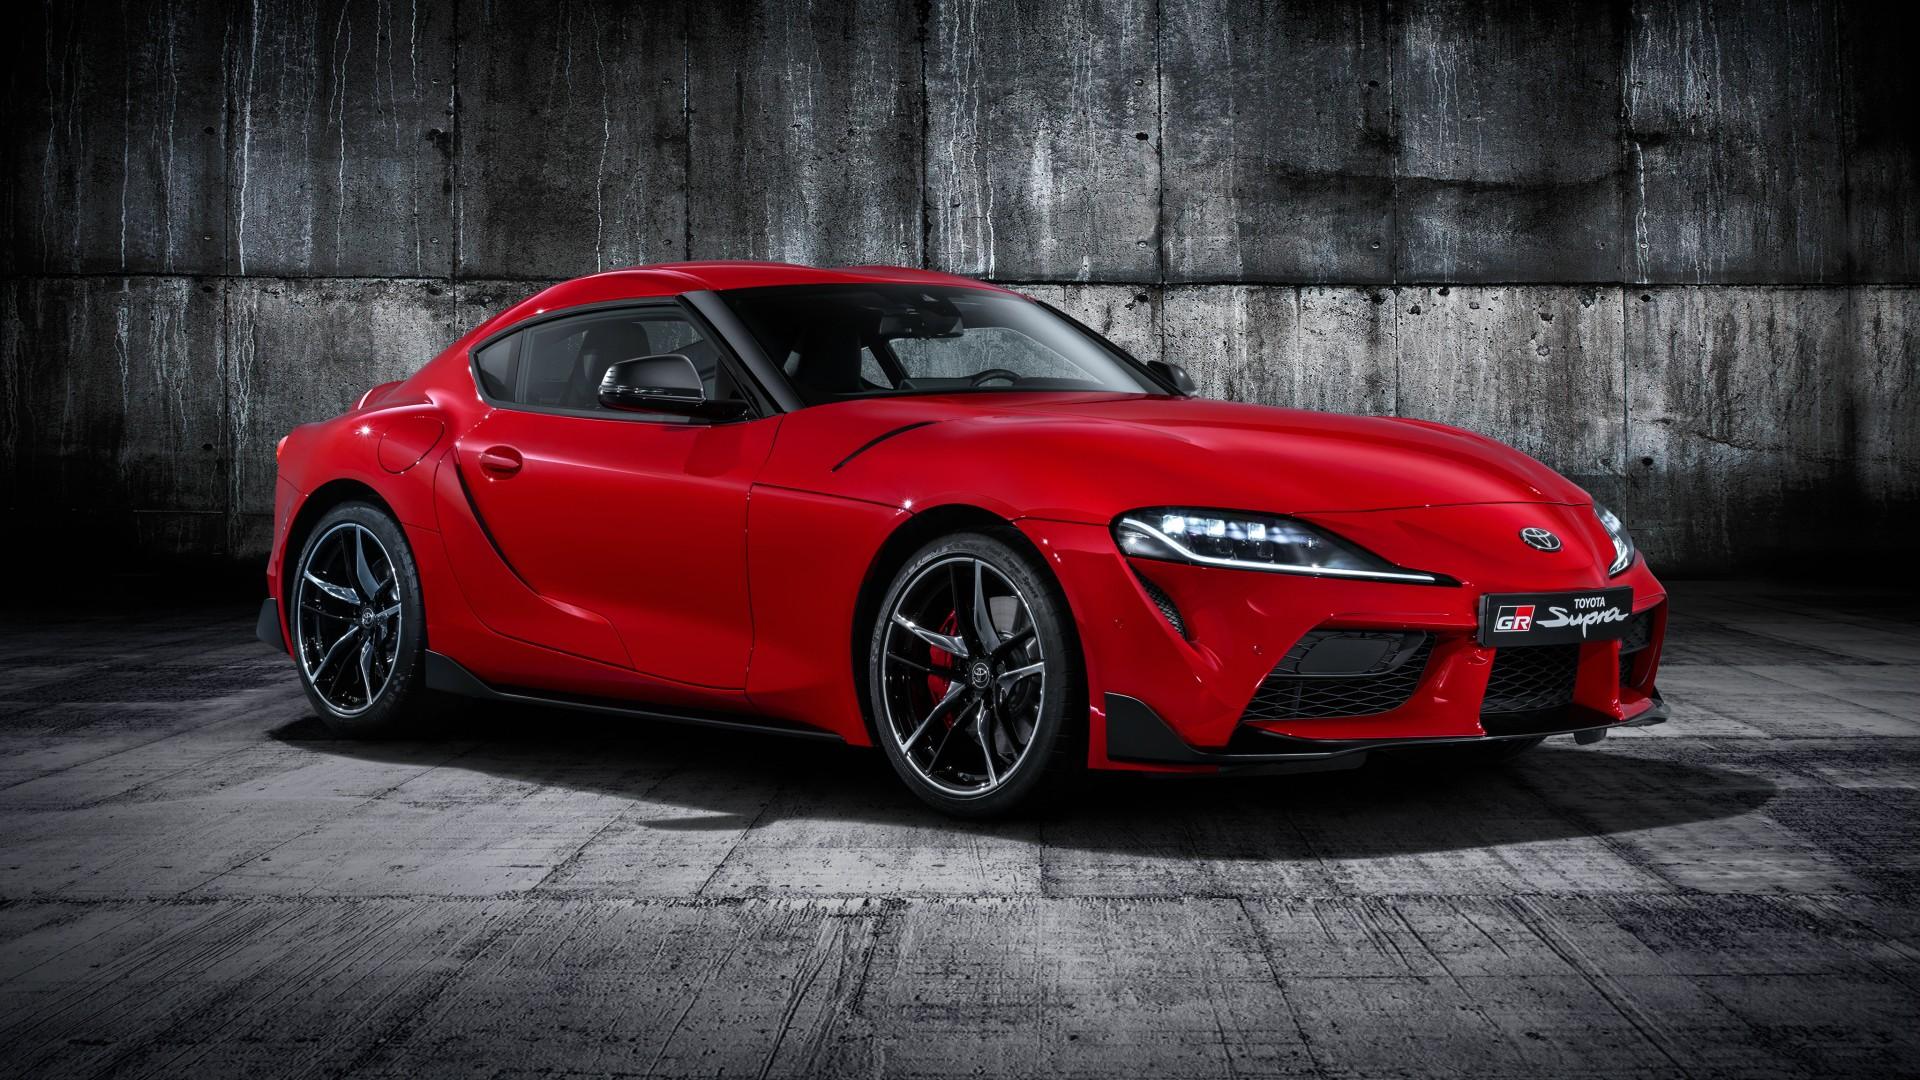 2015 Toyota Supra >> Toyota GR Supra 2019 4K Wallpaper | HD Car Wallpapers | ID ...